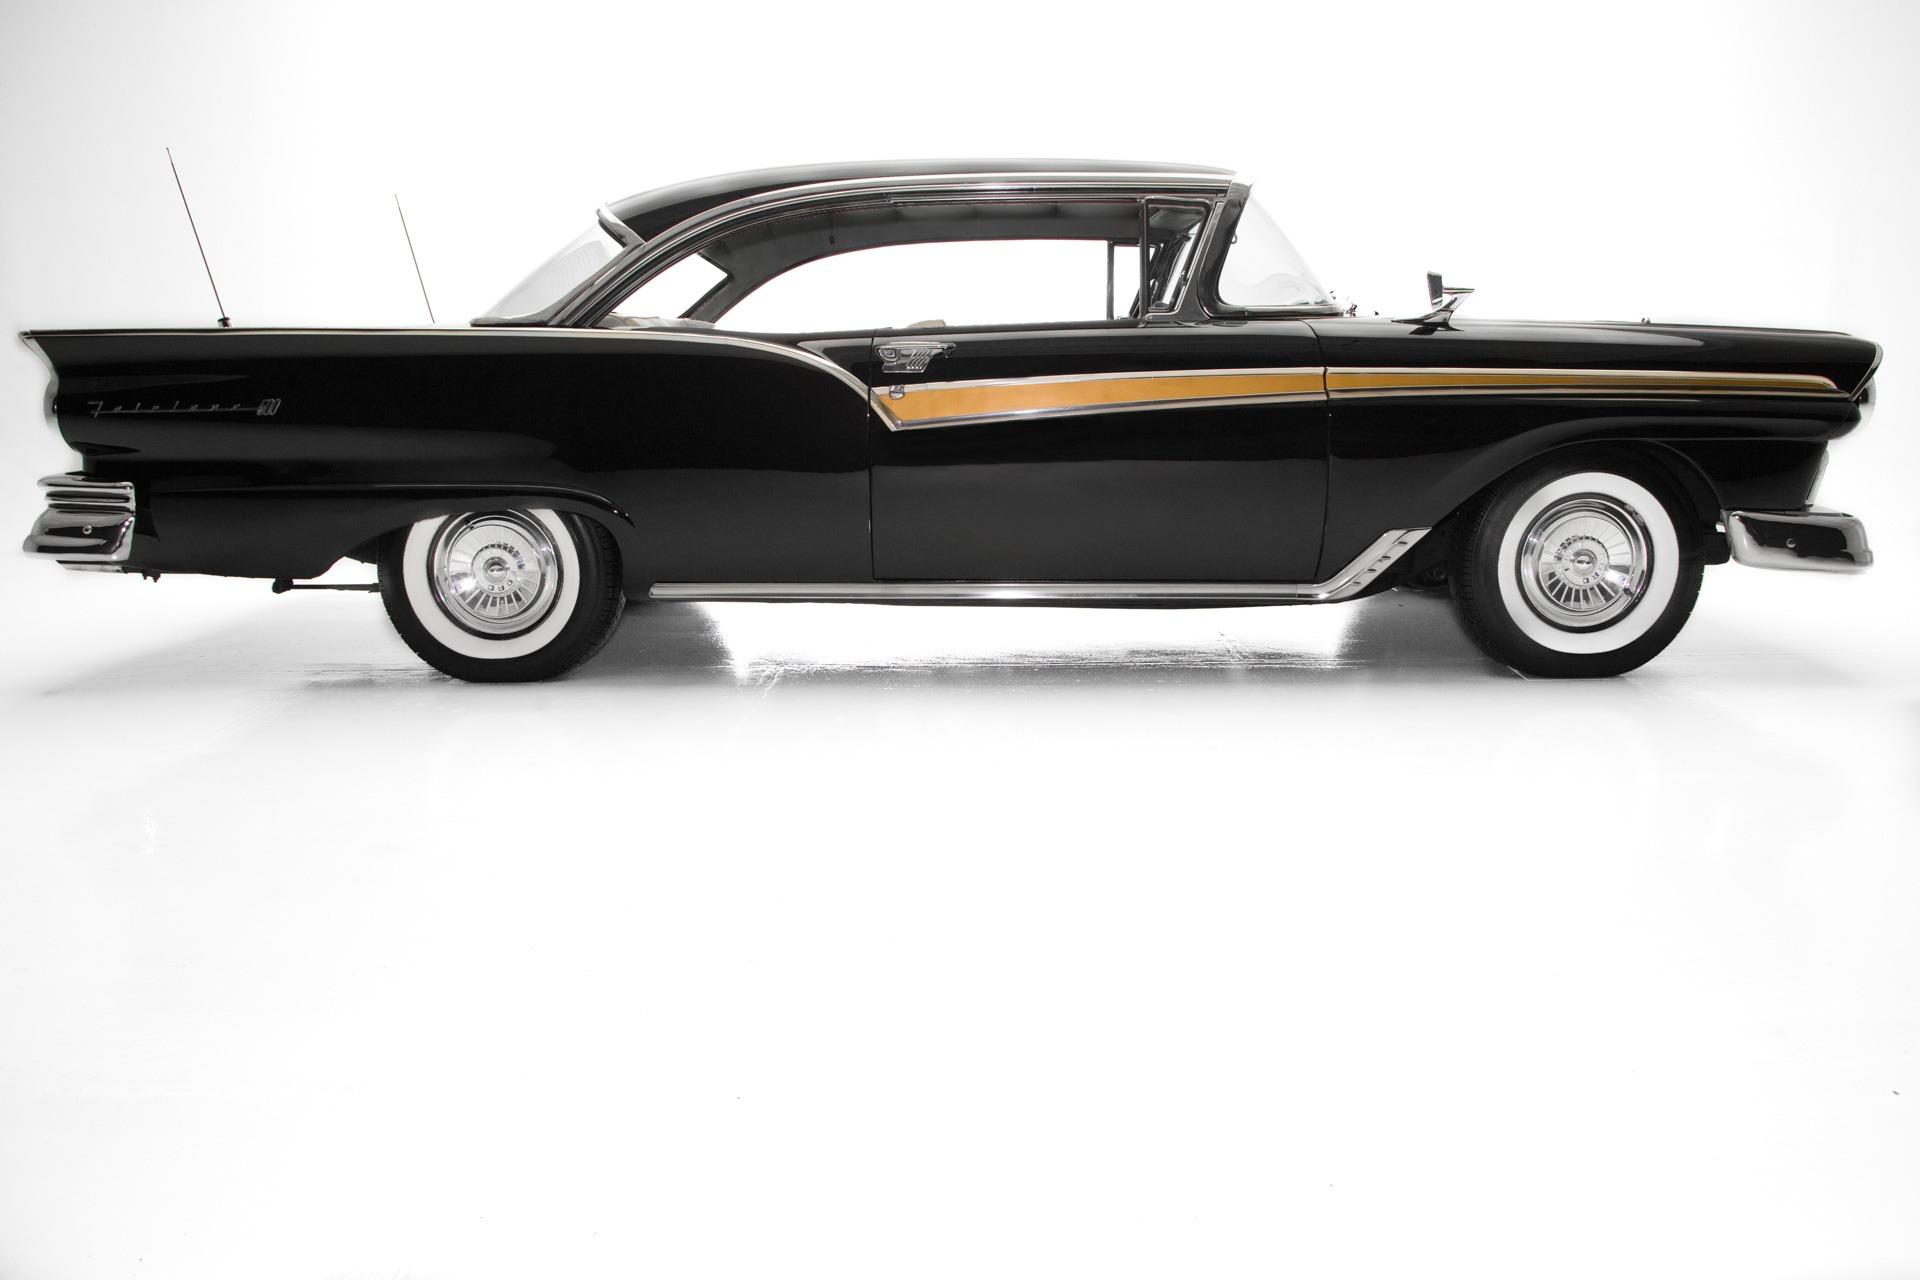 Photo 1957 Ford Fairlane 500 Black on Black V8 Show Chrome WHOLESALE CLEARANCE PRICED 27900